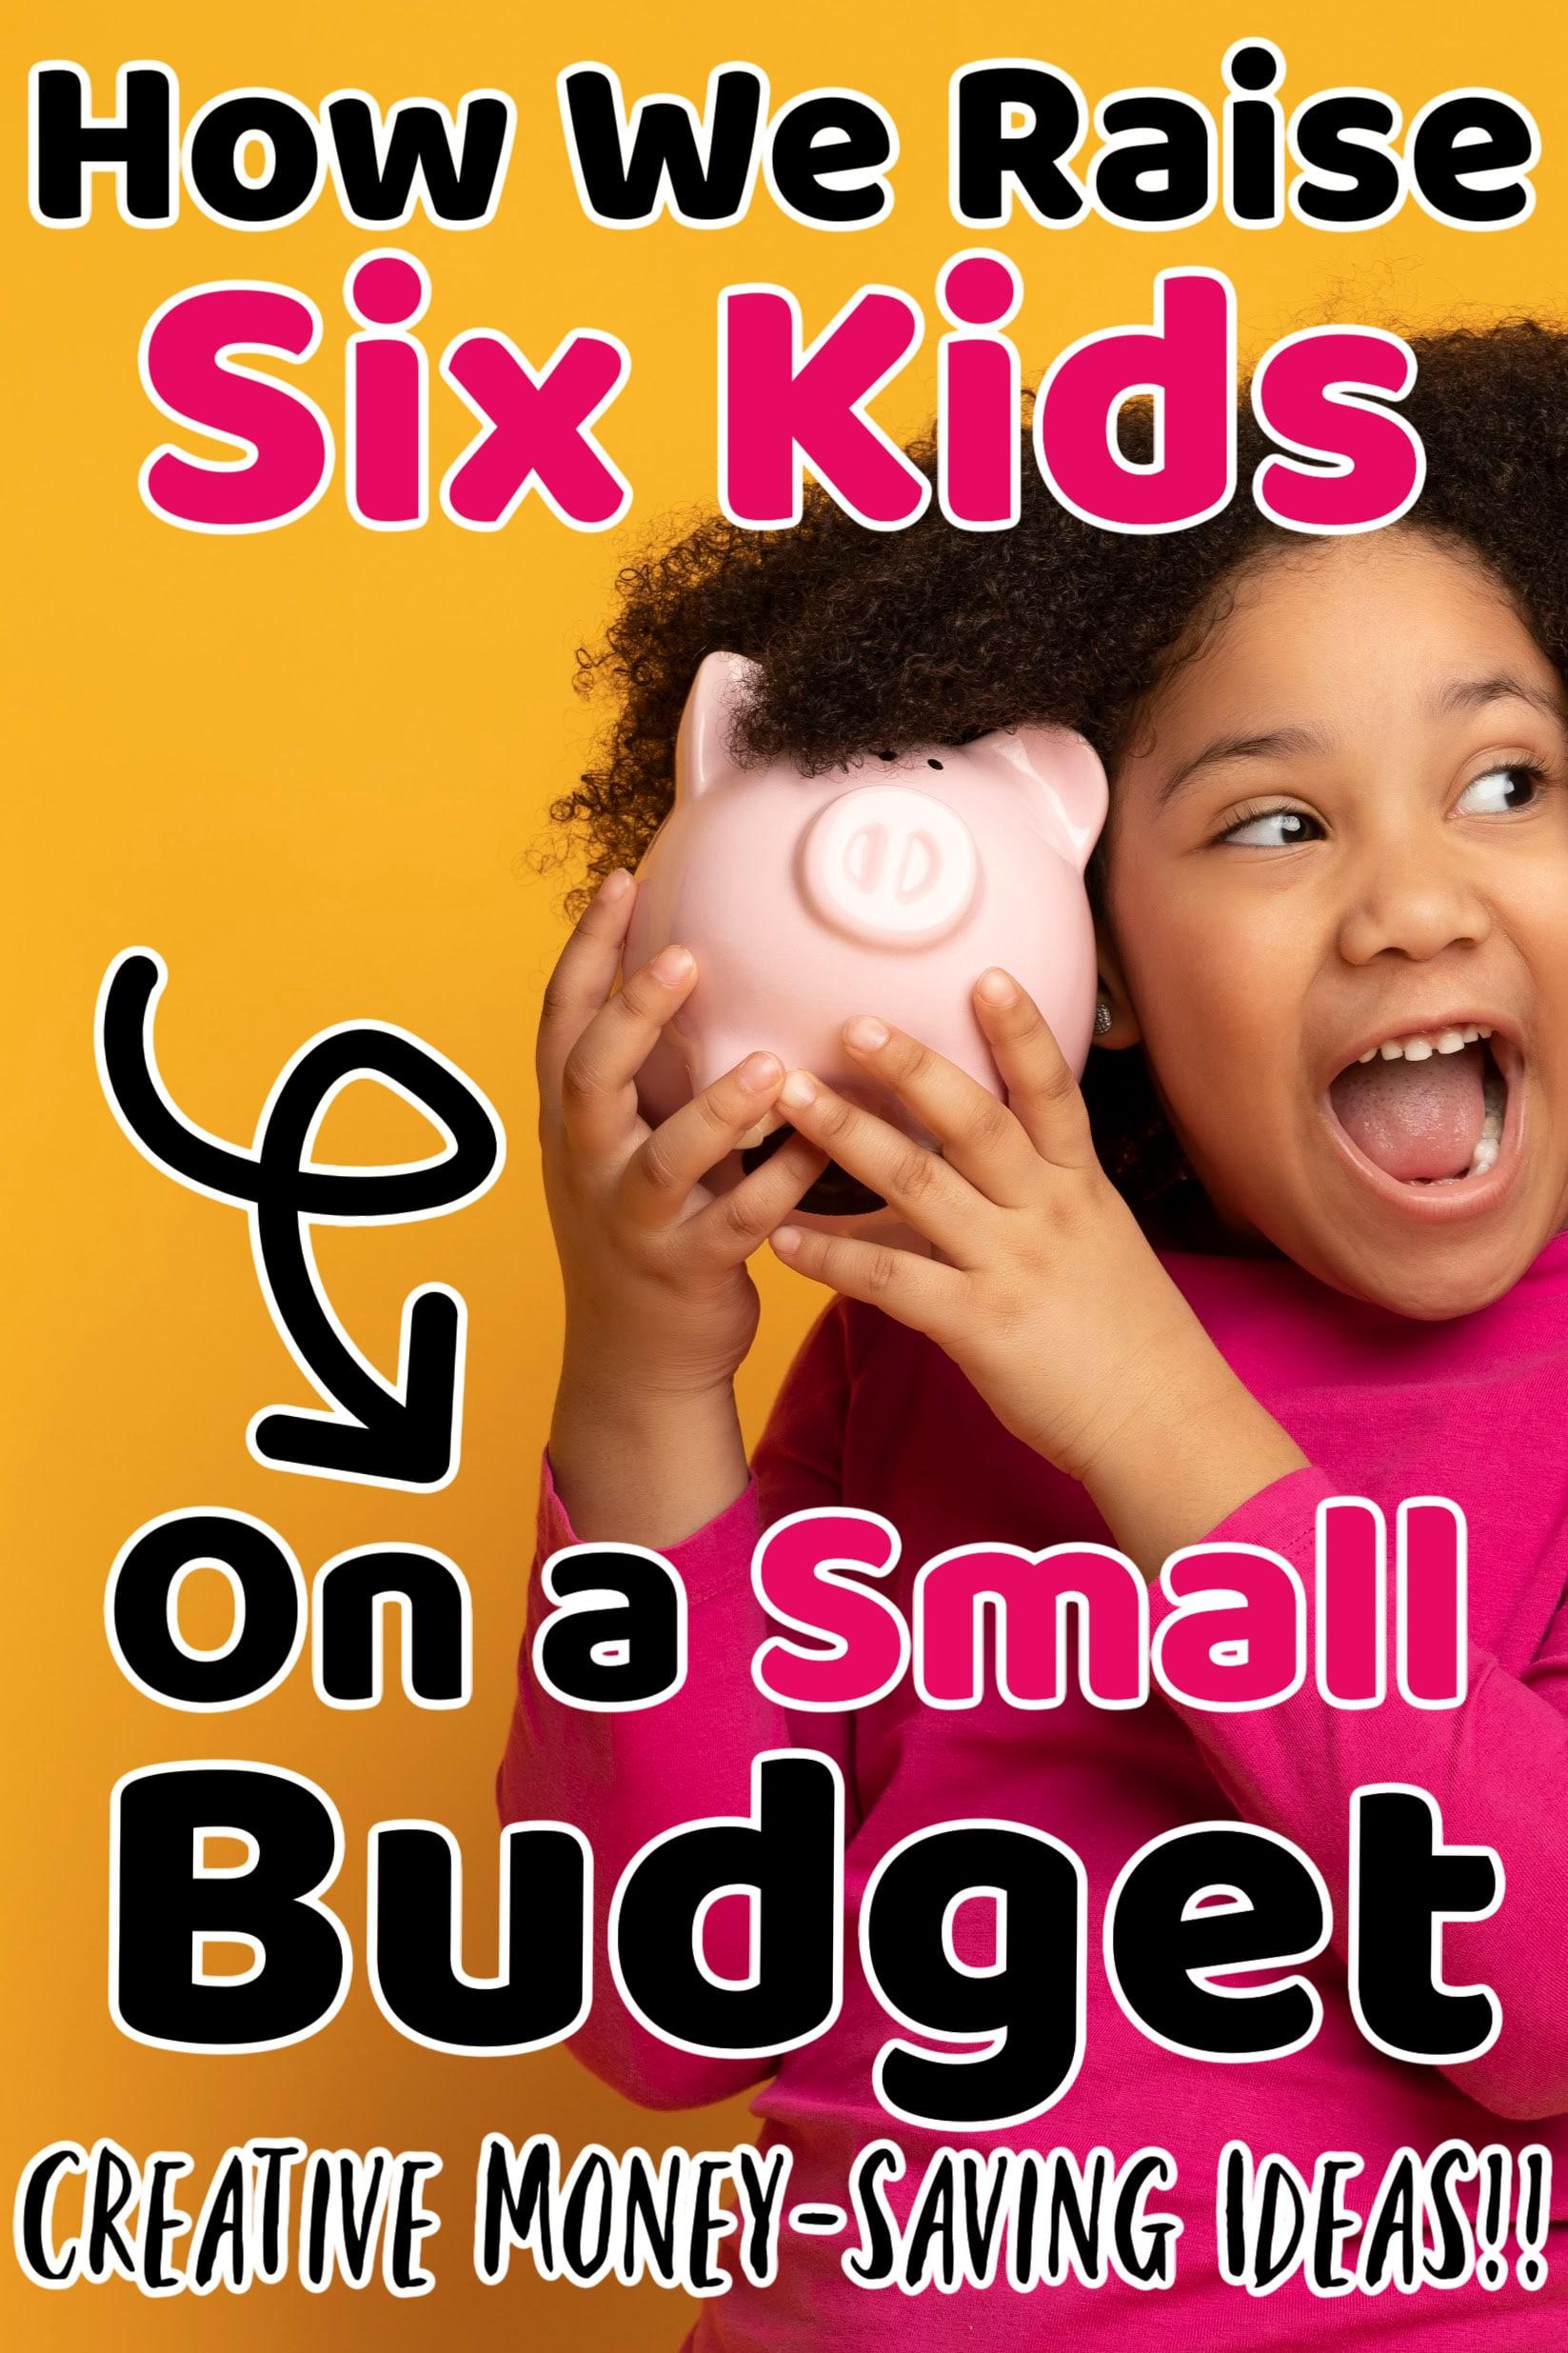 how ot raise kids on a small budget